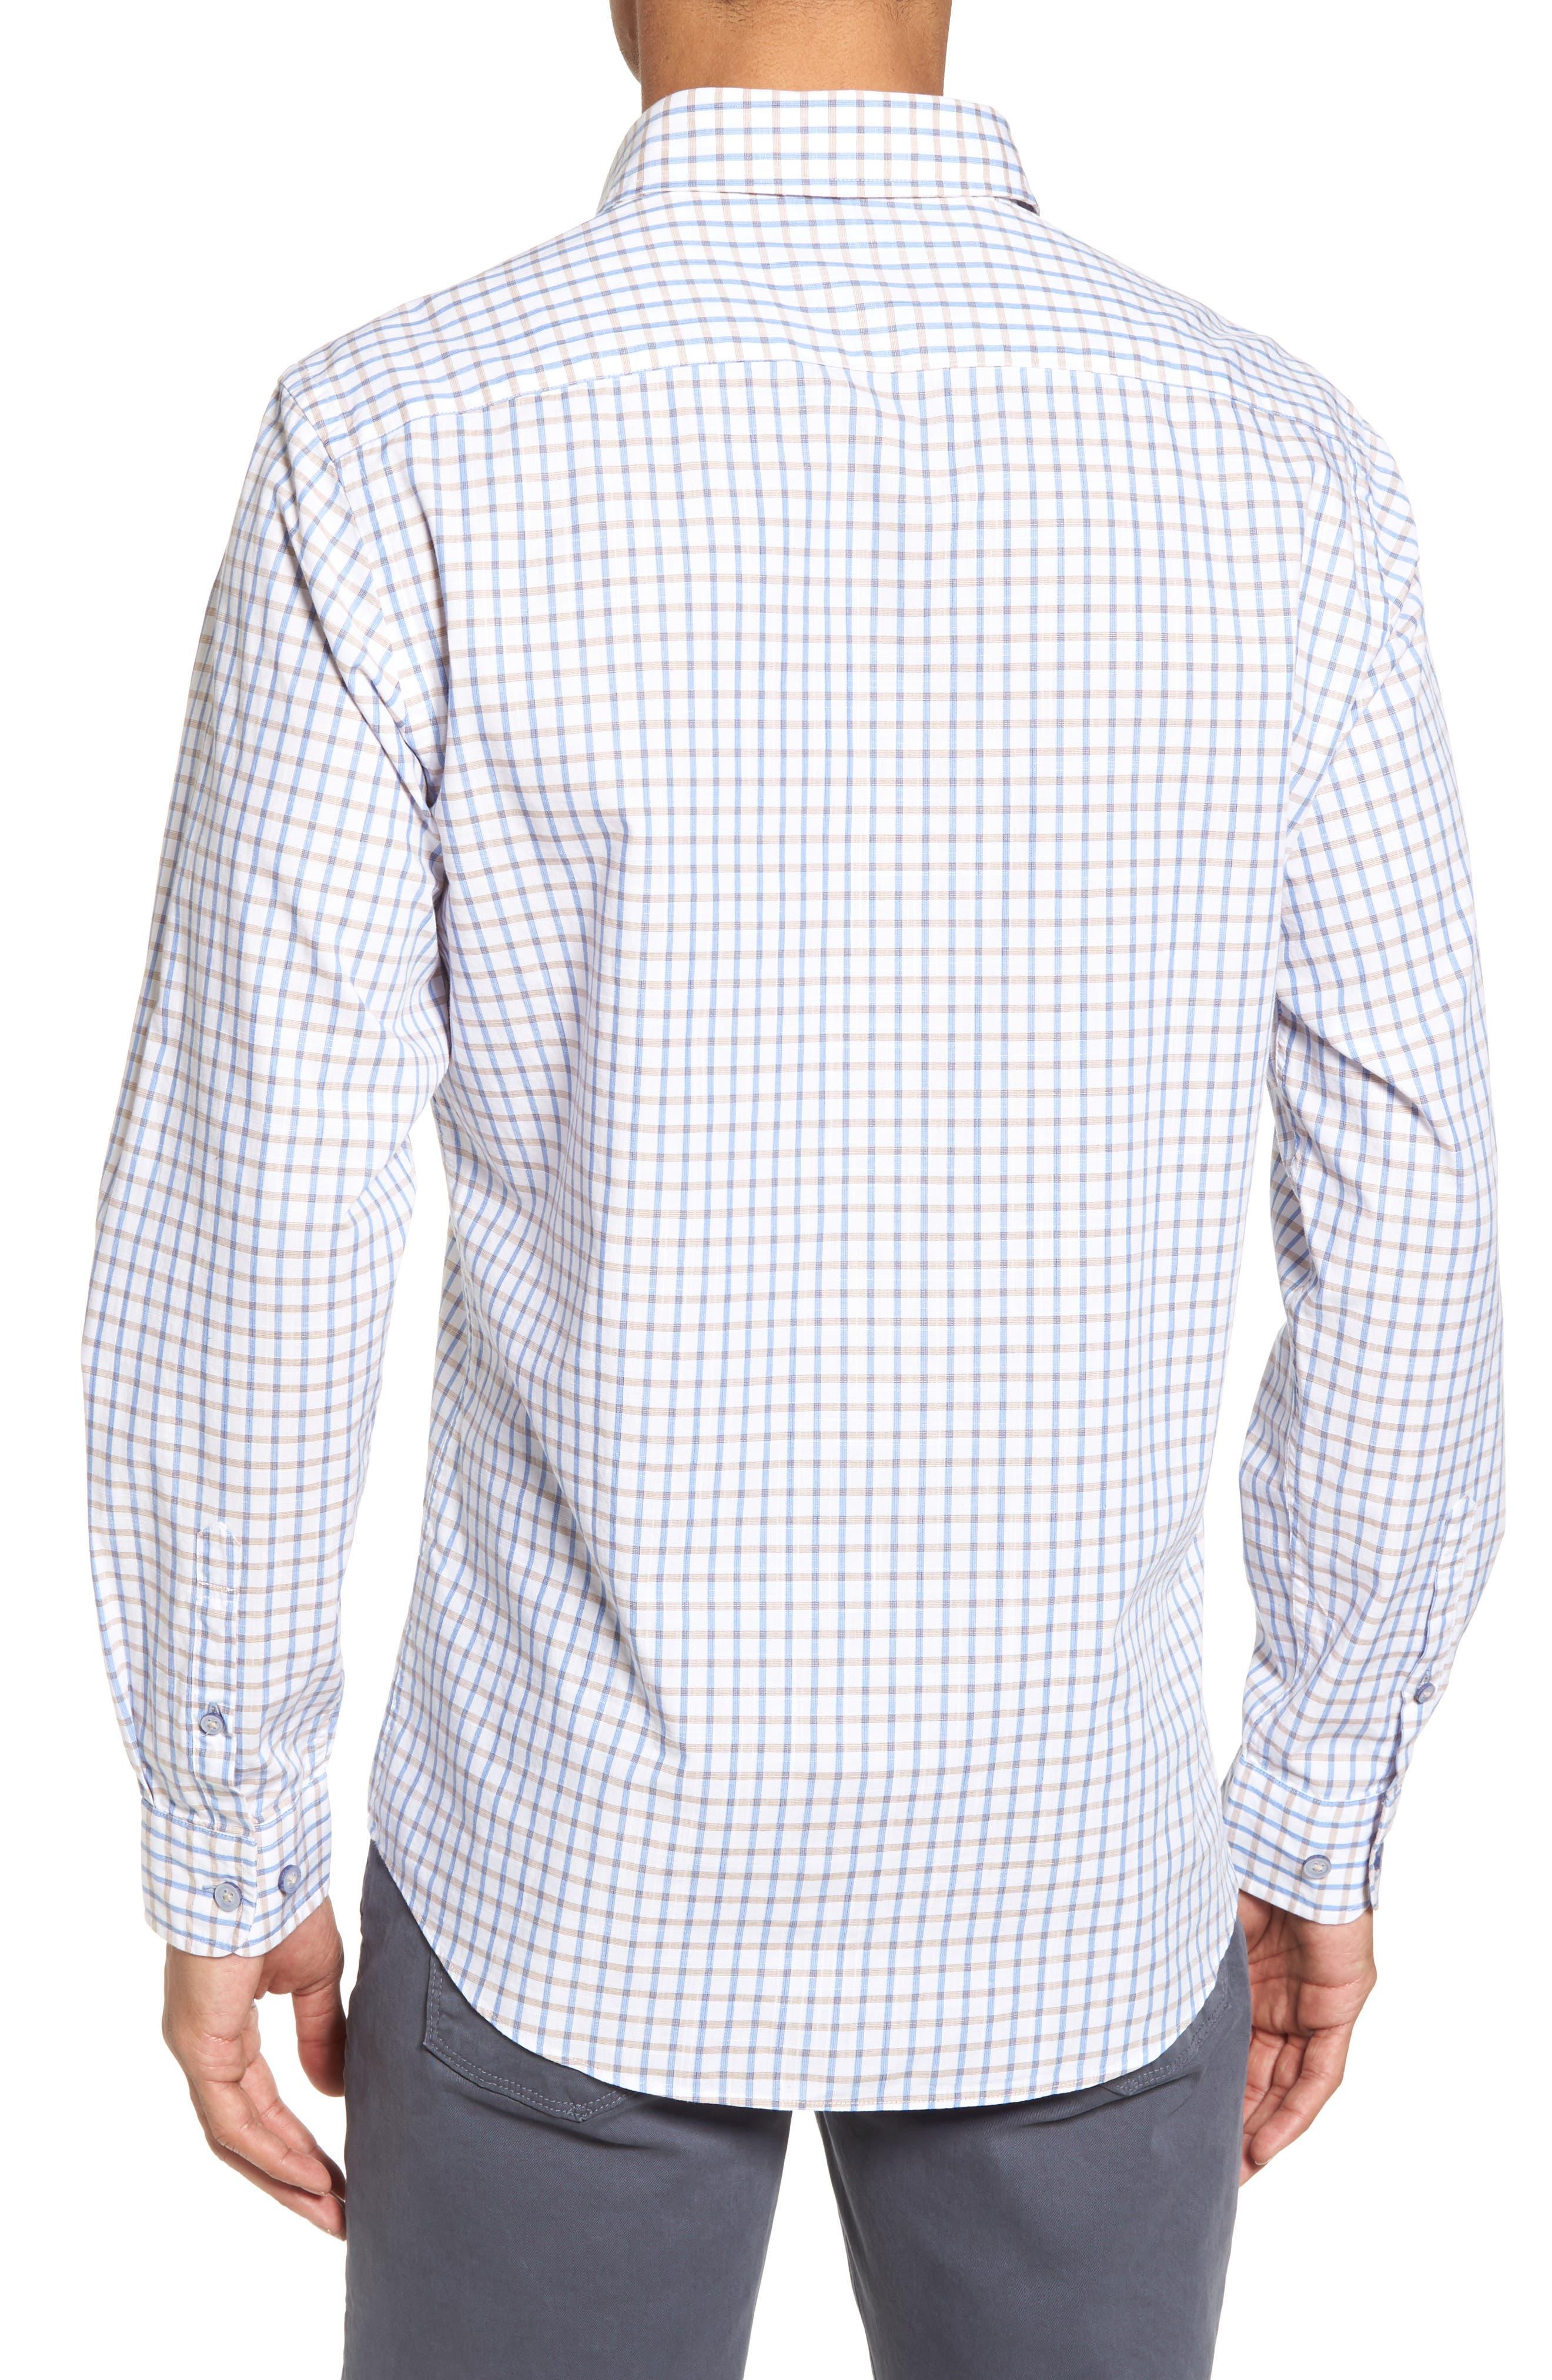 Mount Edward Check Sport Shirt,                             Alternate thumbnail 2, color,                             111